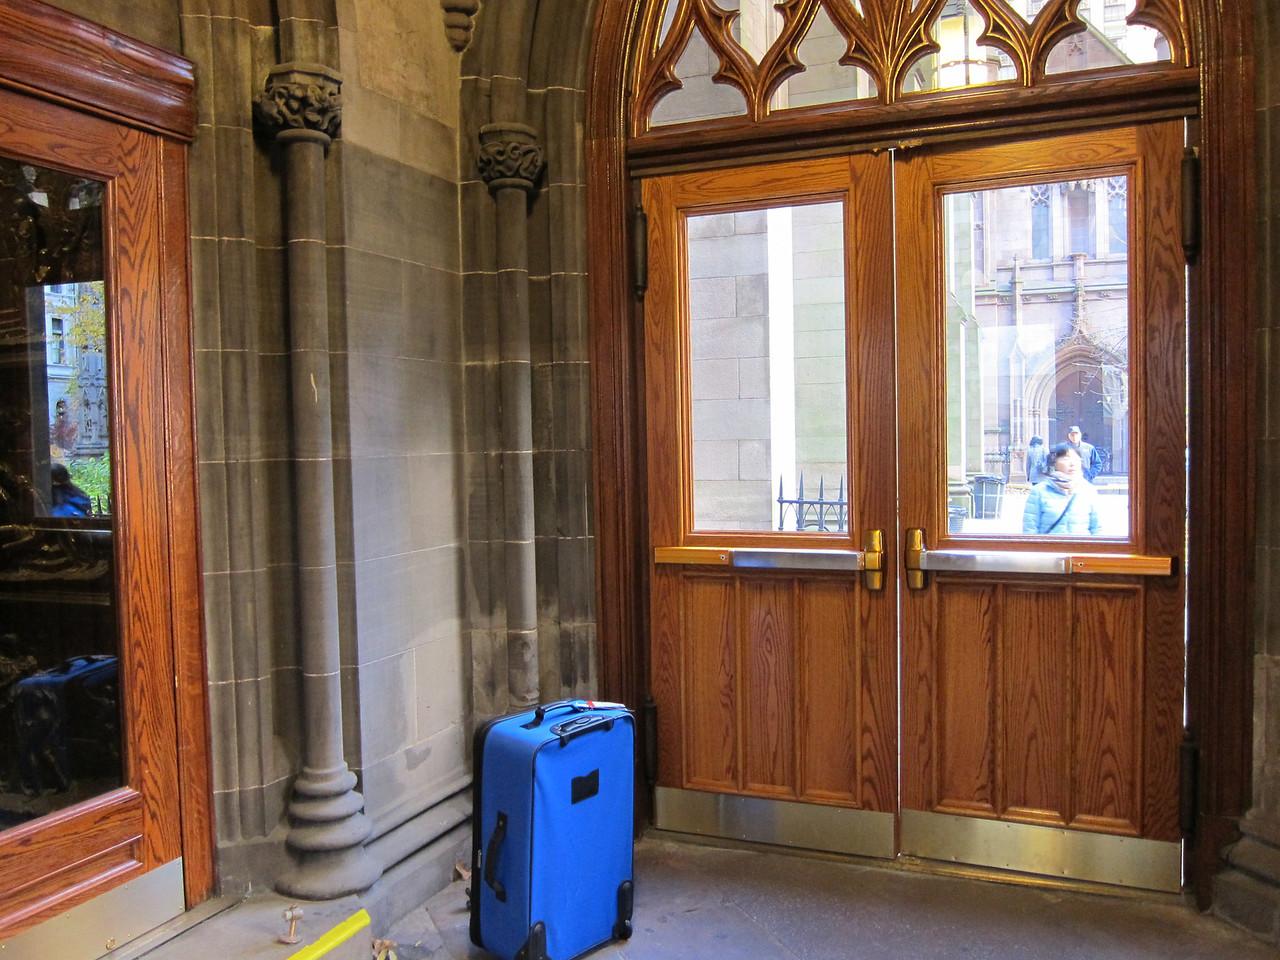 xTrinity Wall Street Church_2013-11-20_4661_north entryway vestibule, church entrance on left